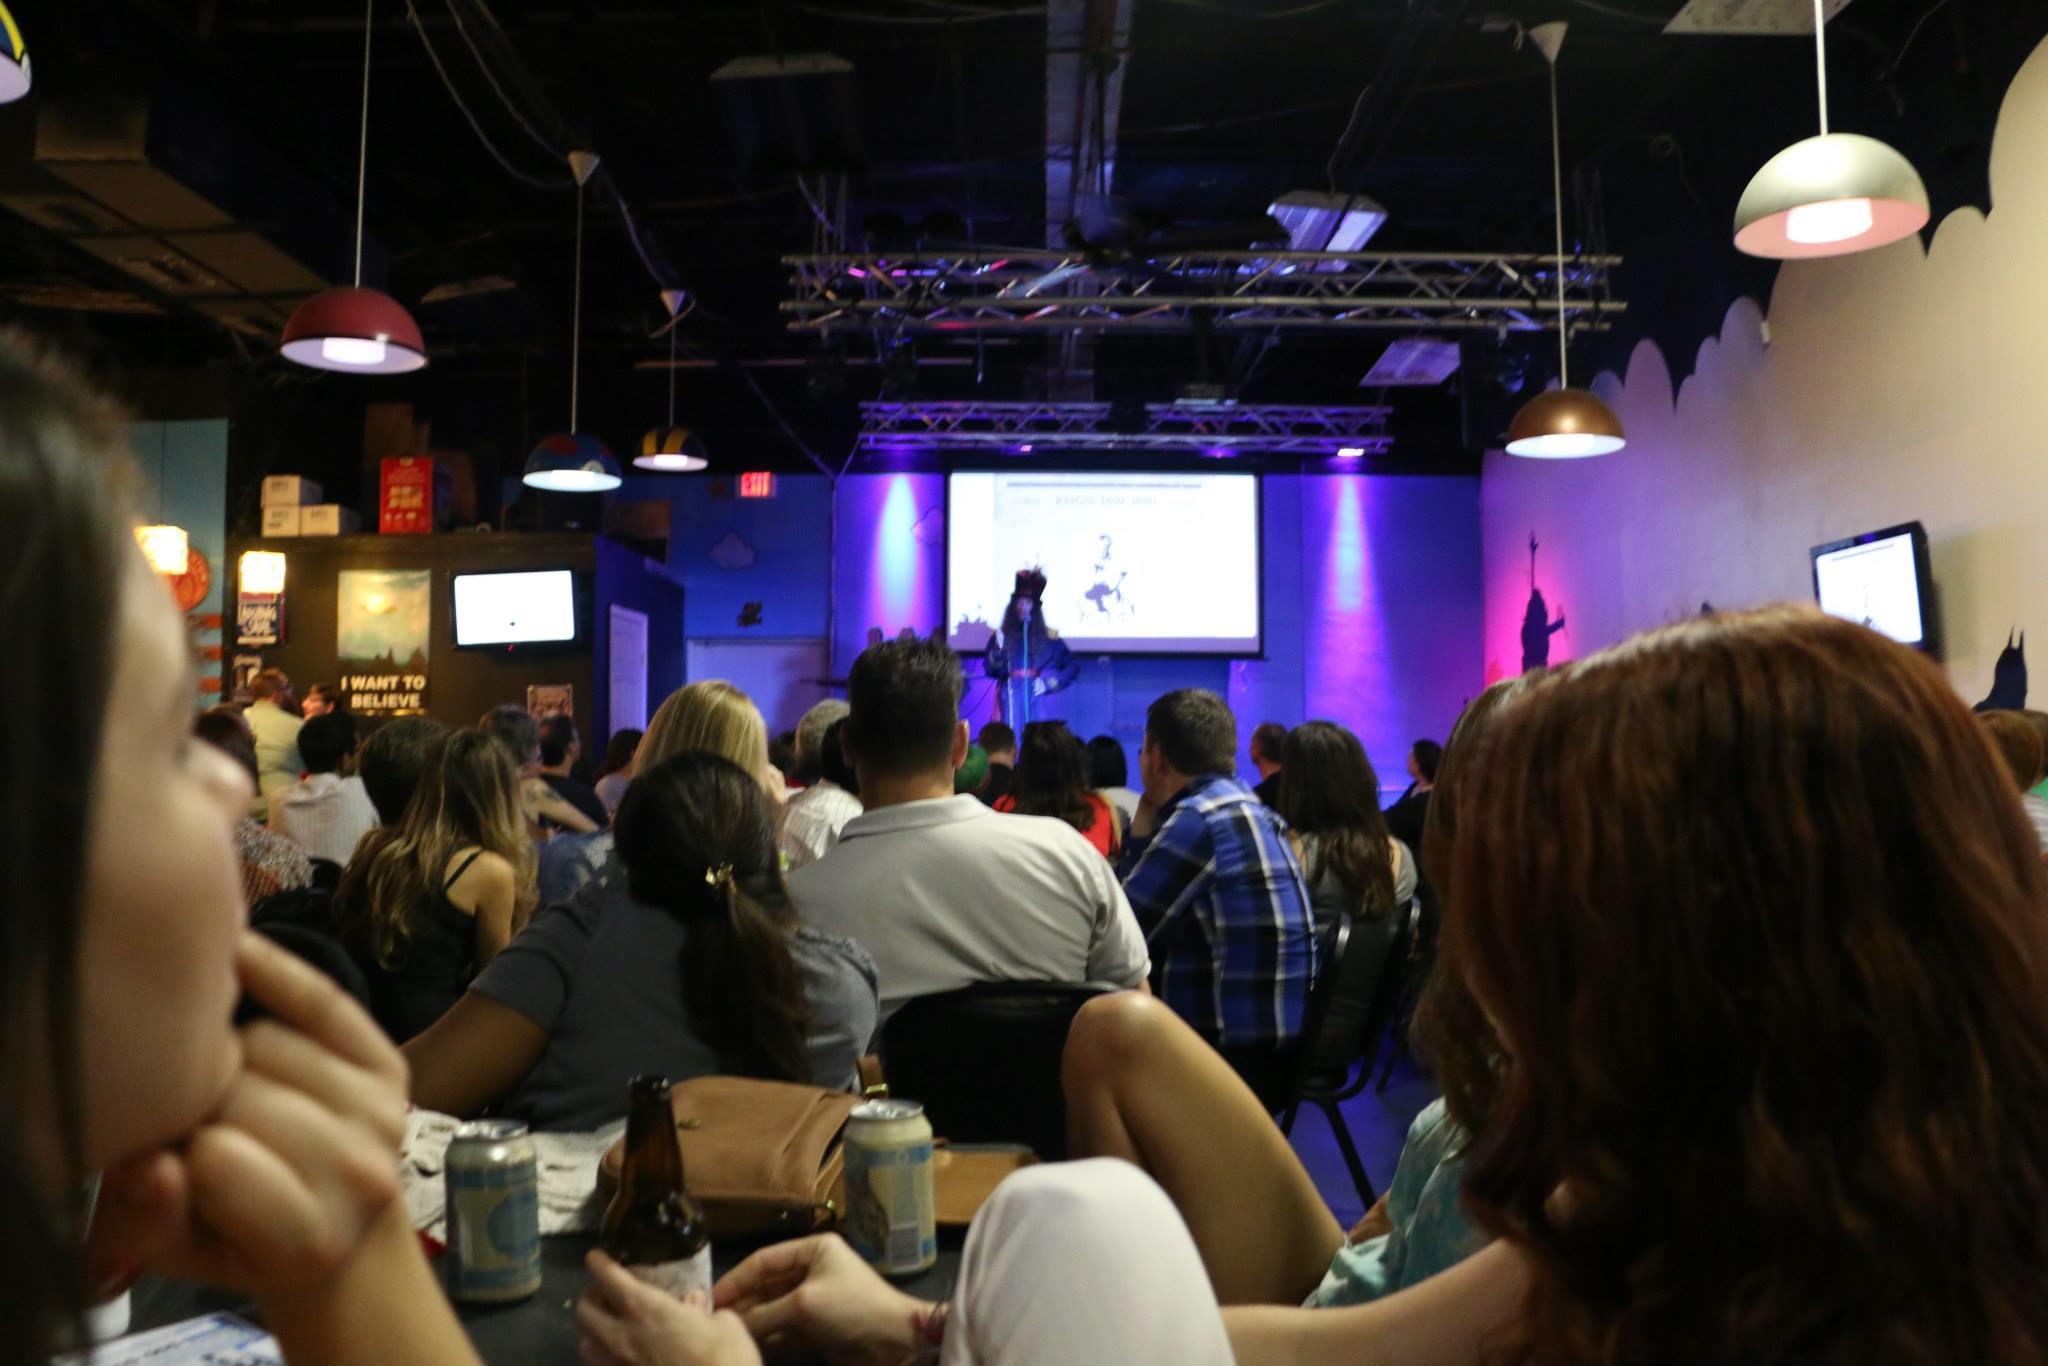 Jonathan Pamplin offers a presentation on Emperor Norton at Nerd Nite Orlando XXVII, held at The Geek Easy on 14 May 2015.Photo: Ricardo Williams